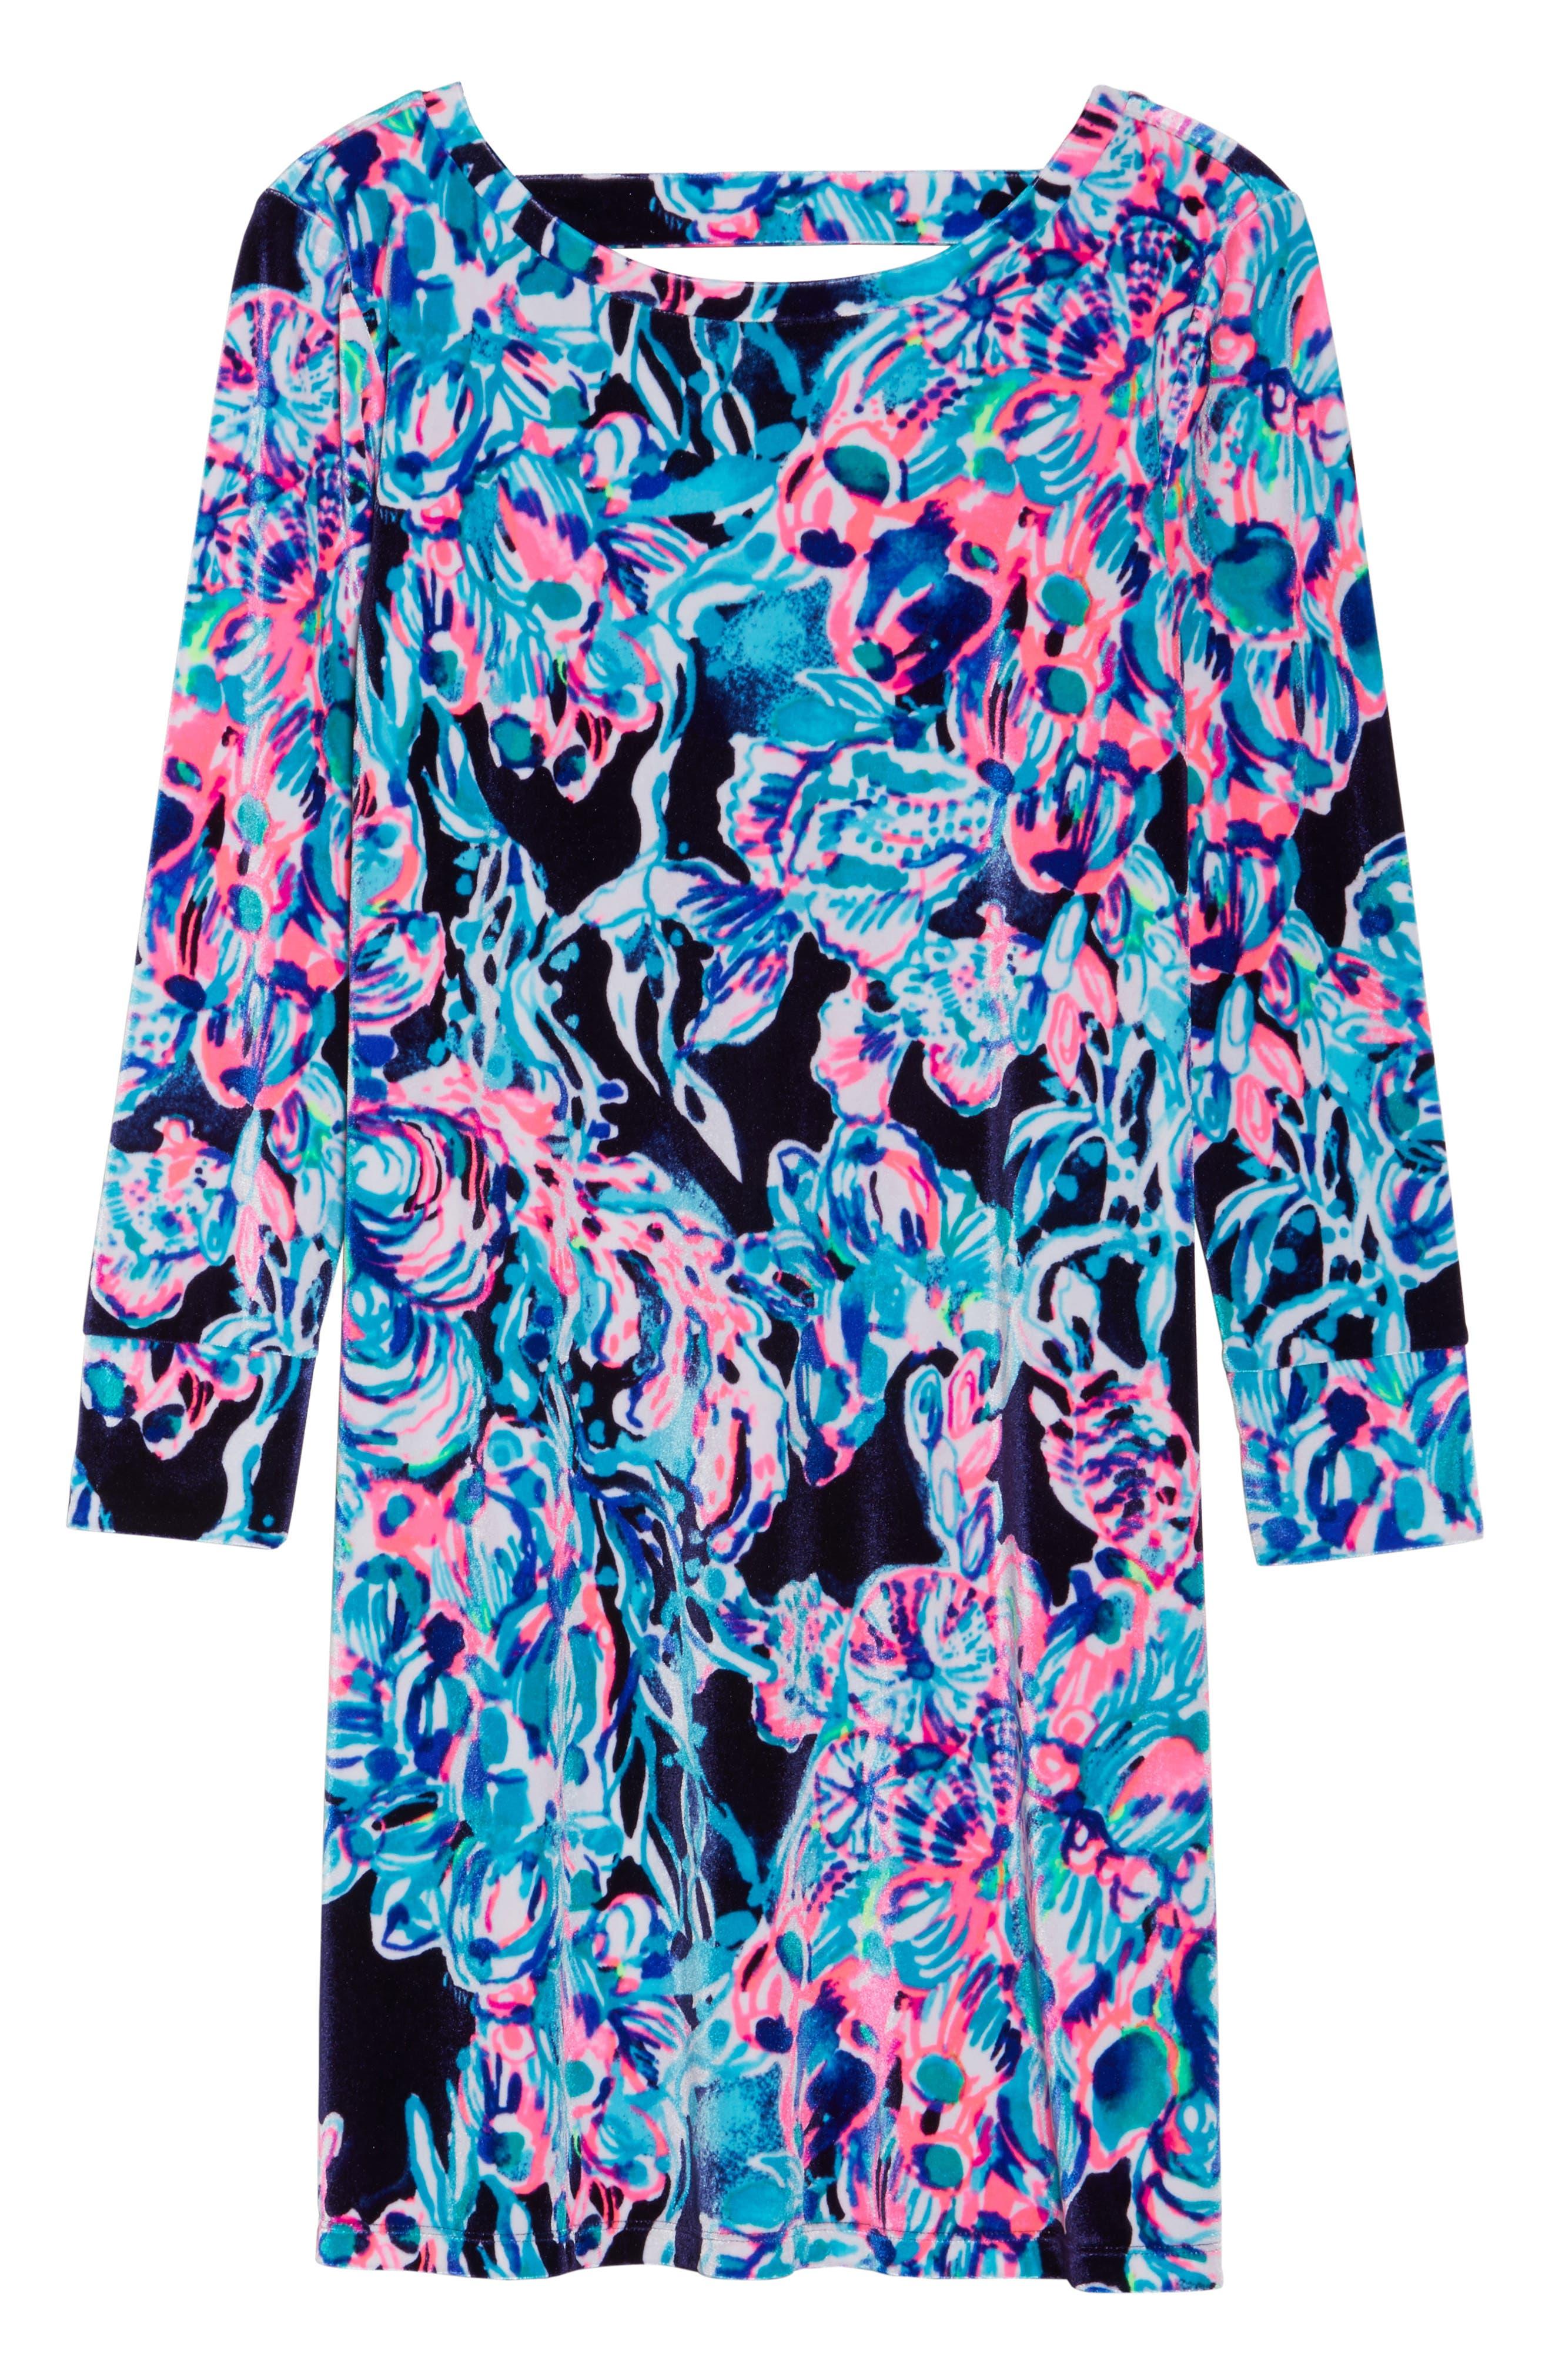 Olive Swing Dress,                             Alternate thumbnail 6, color,                             410